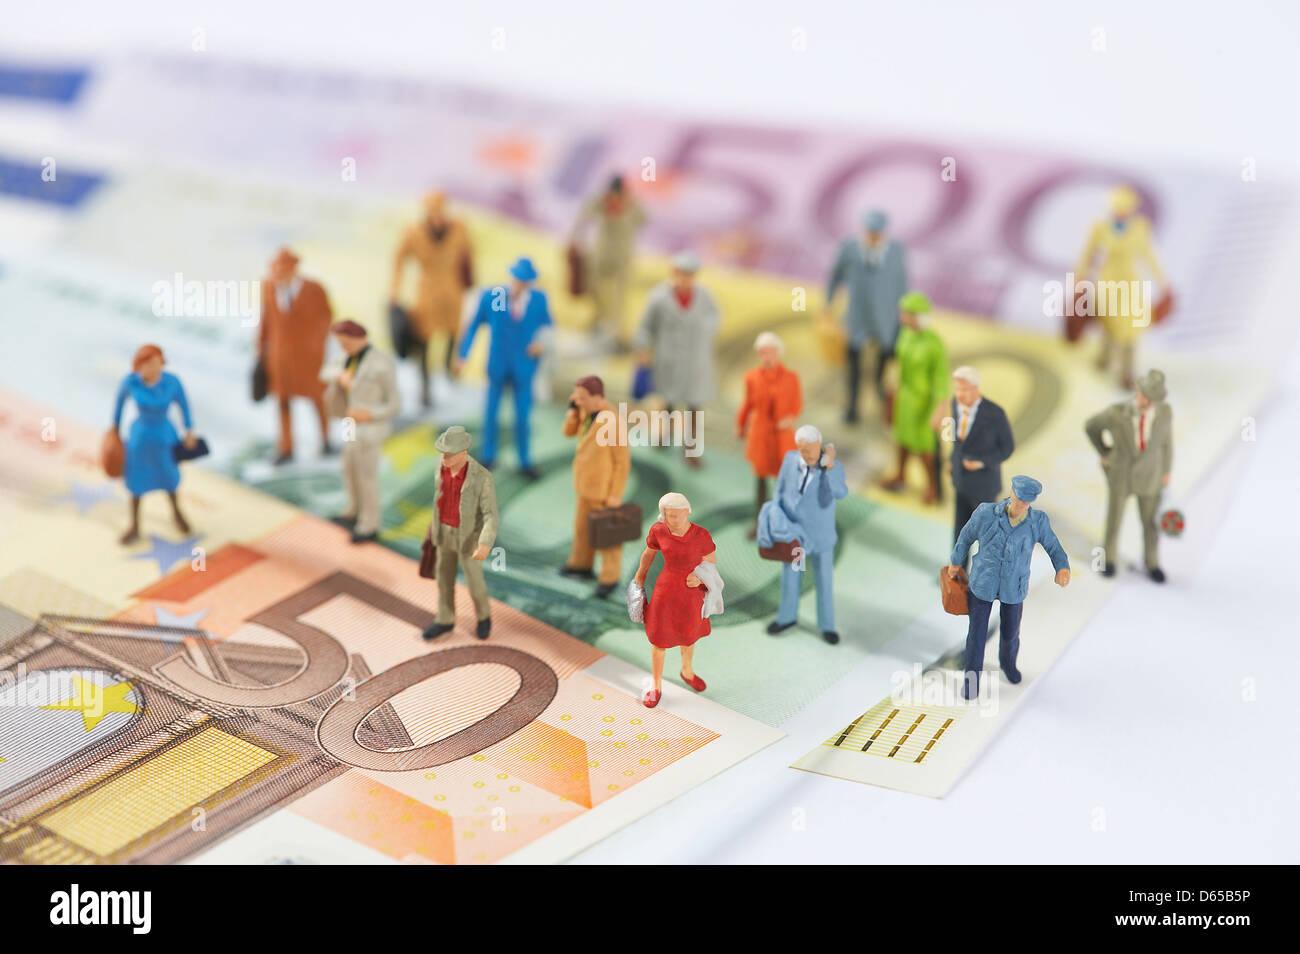 figurine,banknote,business world - Stock Image